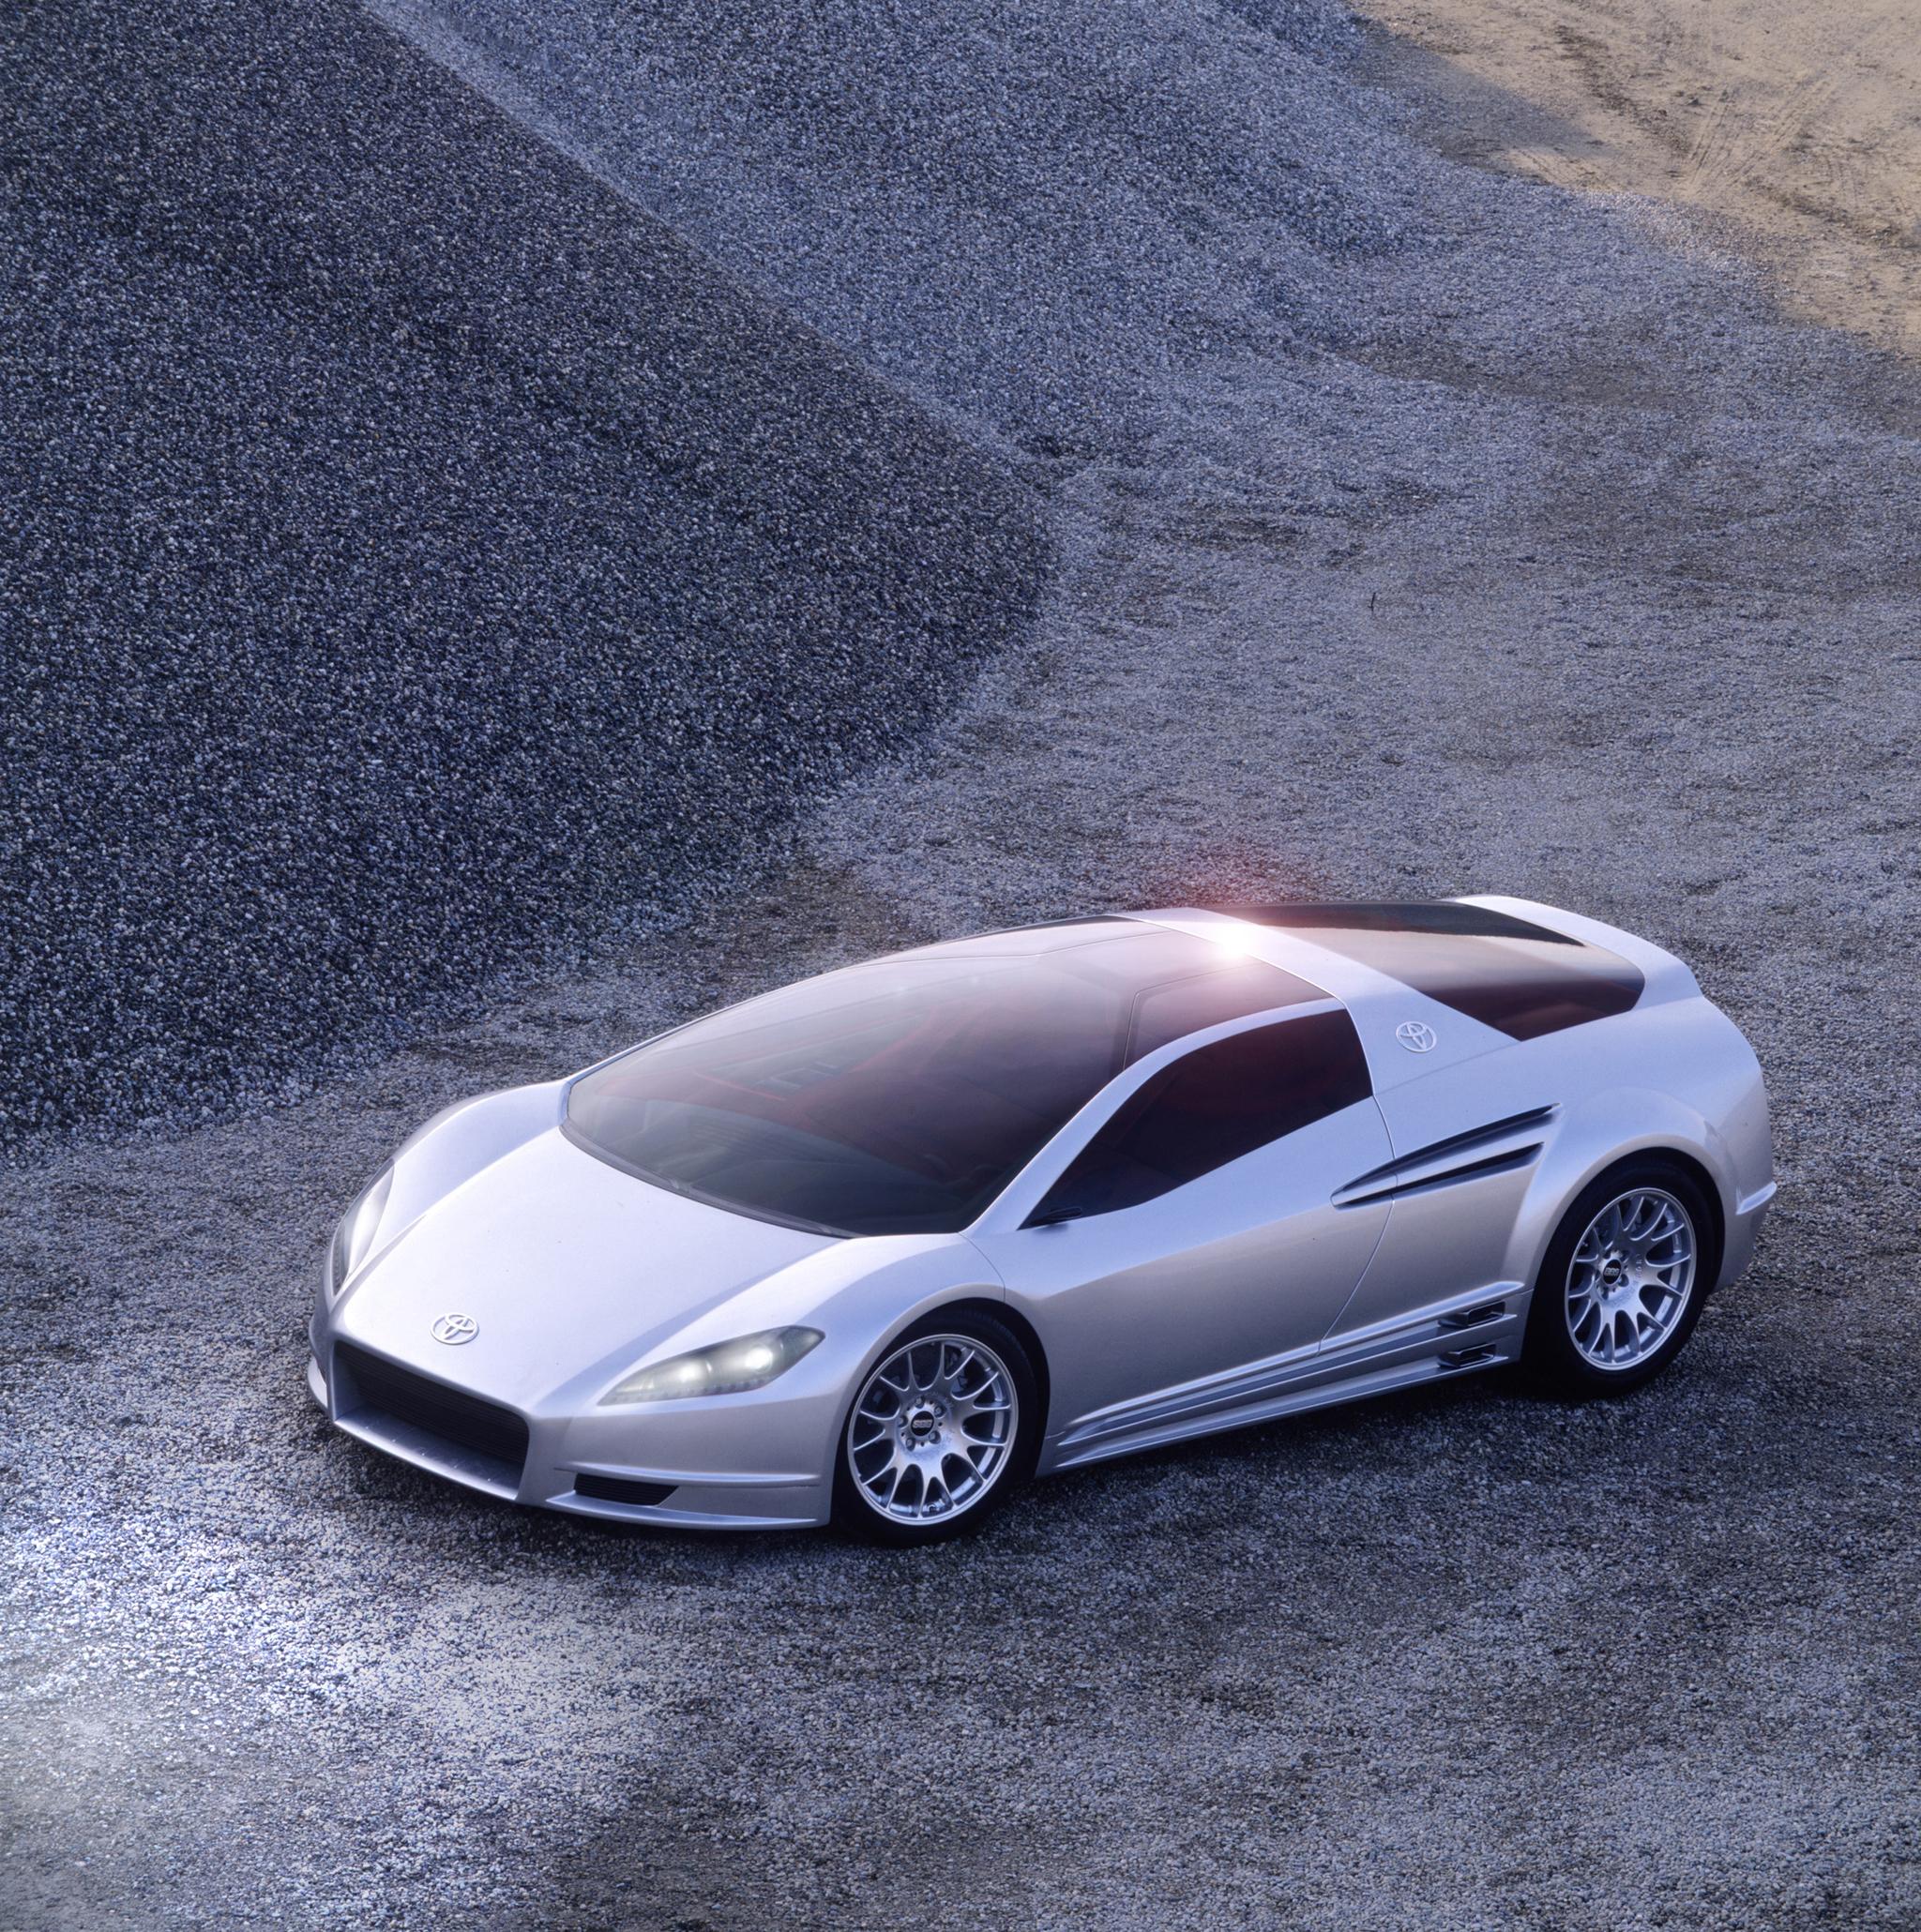 2005 Lexus Rx >> Toyota Volta by Italdesign-Giugiaro S.p.A., Italy | Michelin Challenge Design